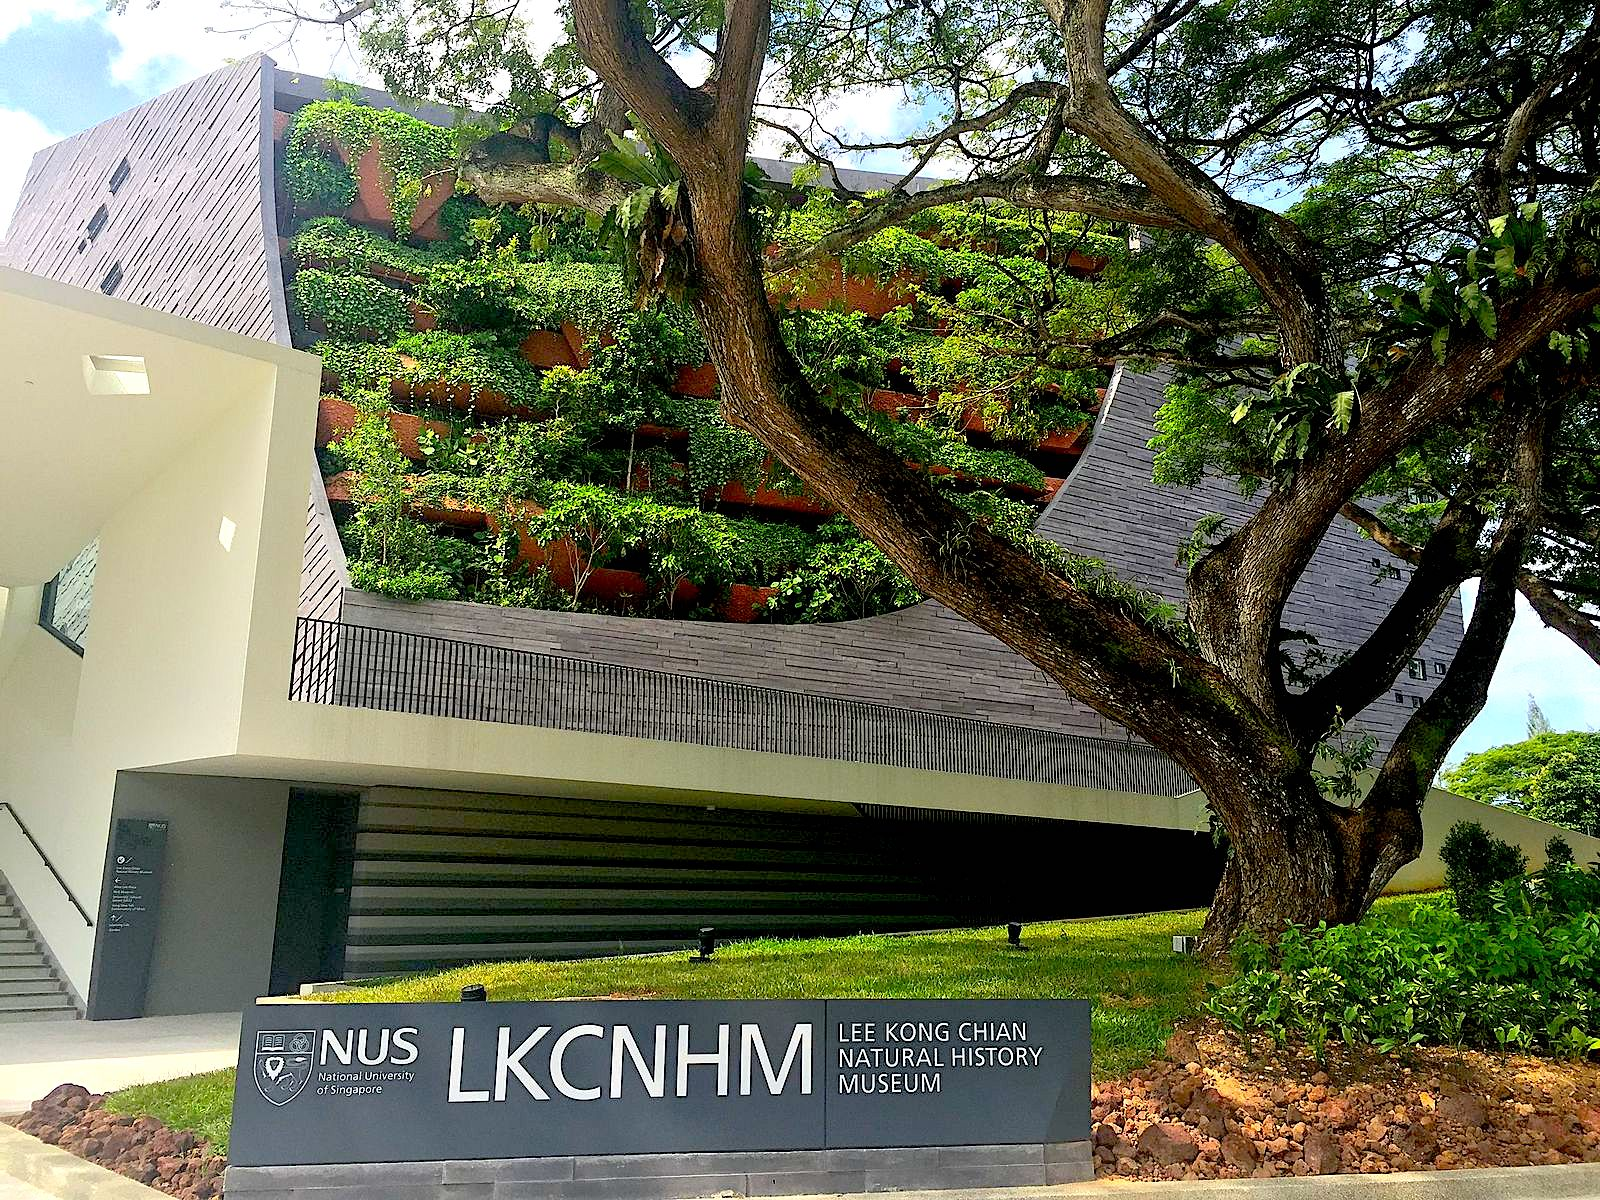 Lee Kong Chian Natural History Museum (NUS) Singapore